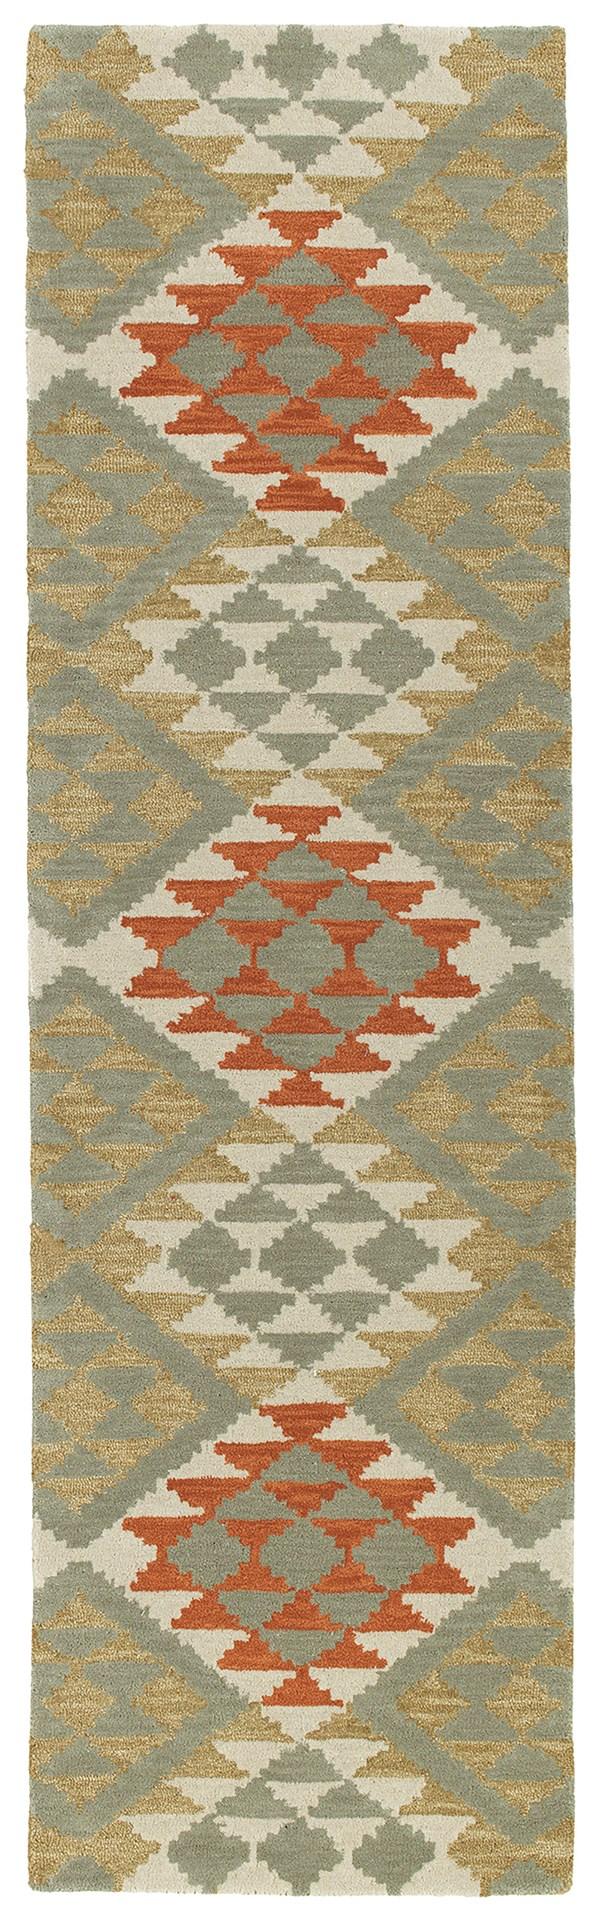 Paprika, Grey, Heathered Camel, Paprika (53) Southwestern / Lodge Area Rug